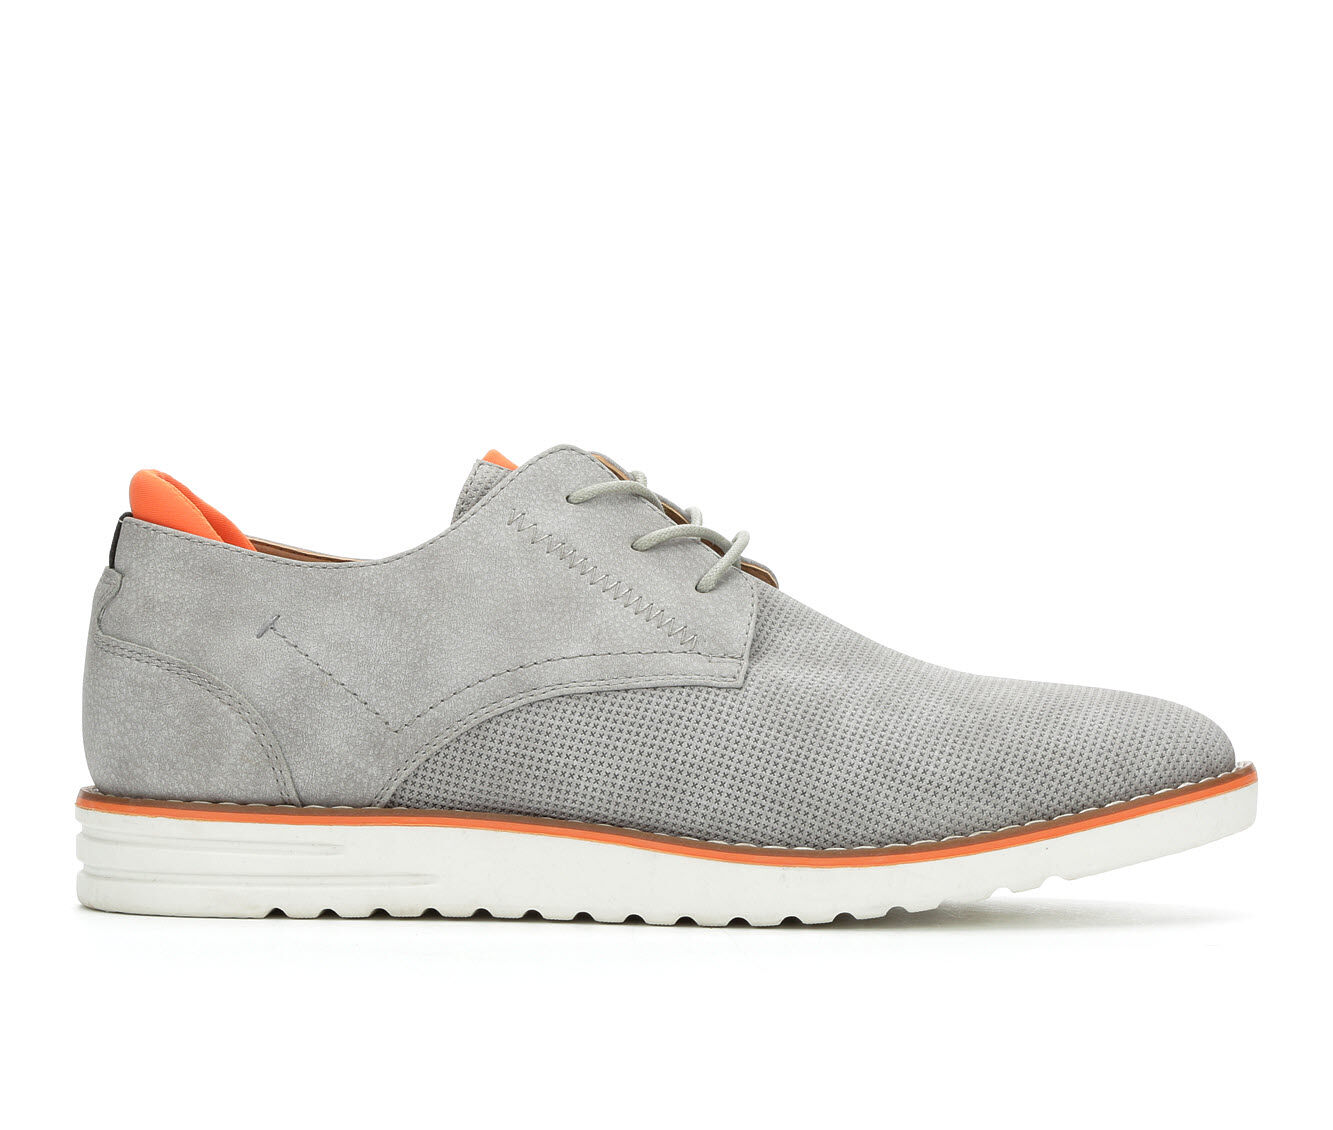 Men's Madden Calen Dress Shoes Grey/Orange